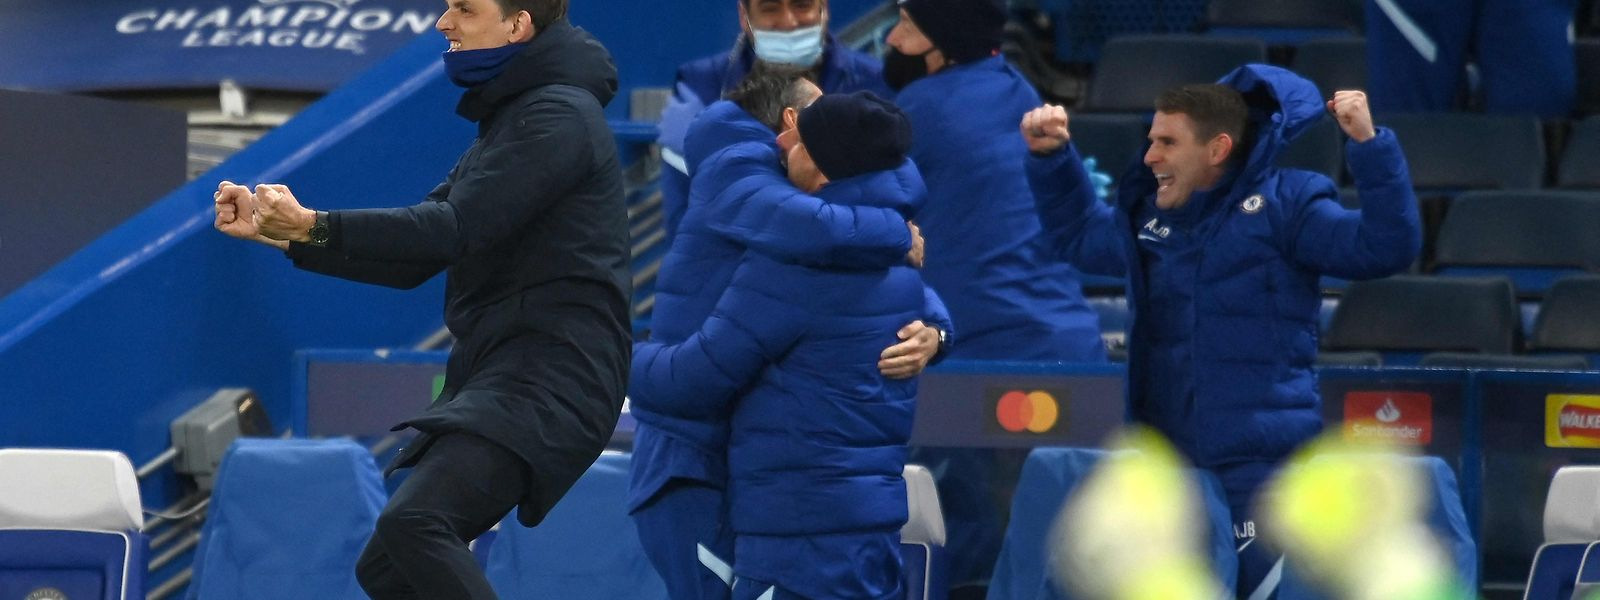 Chelsea-Coach Thomas Tuchel kann seinem Jubel freien Lauf lassen.